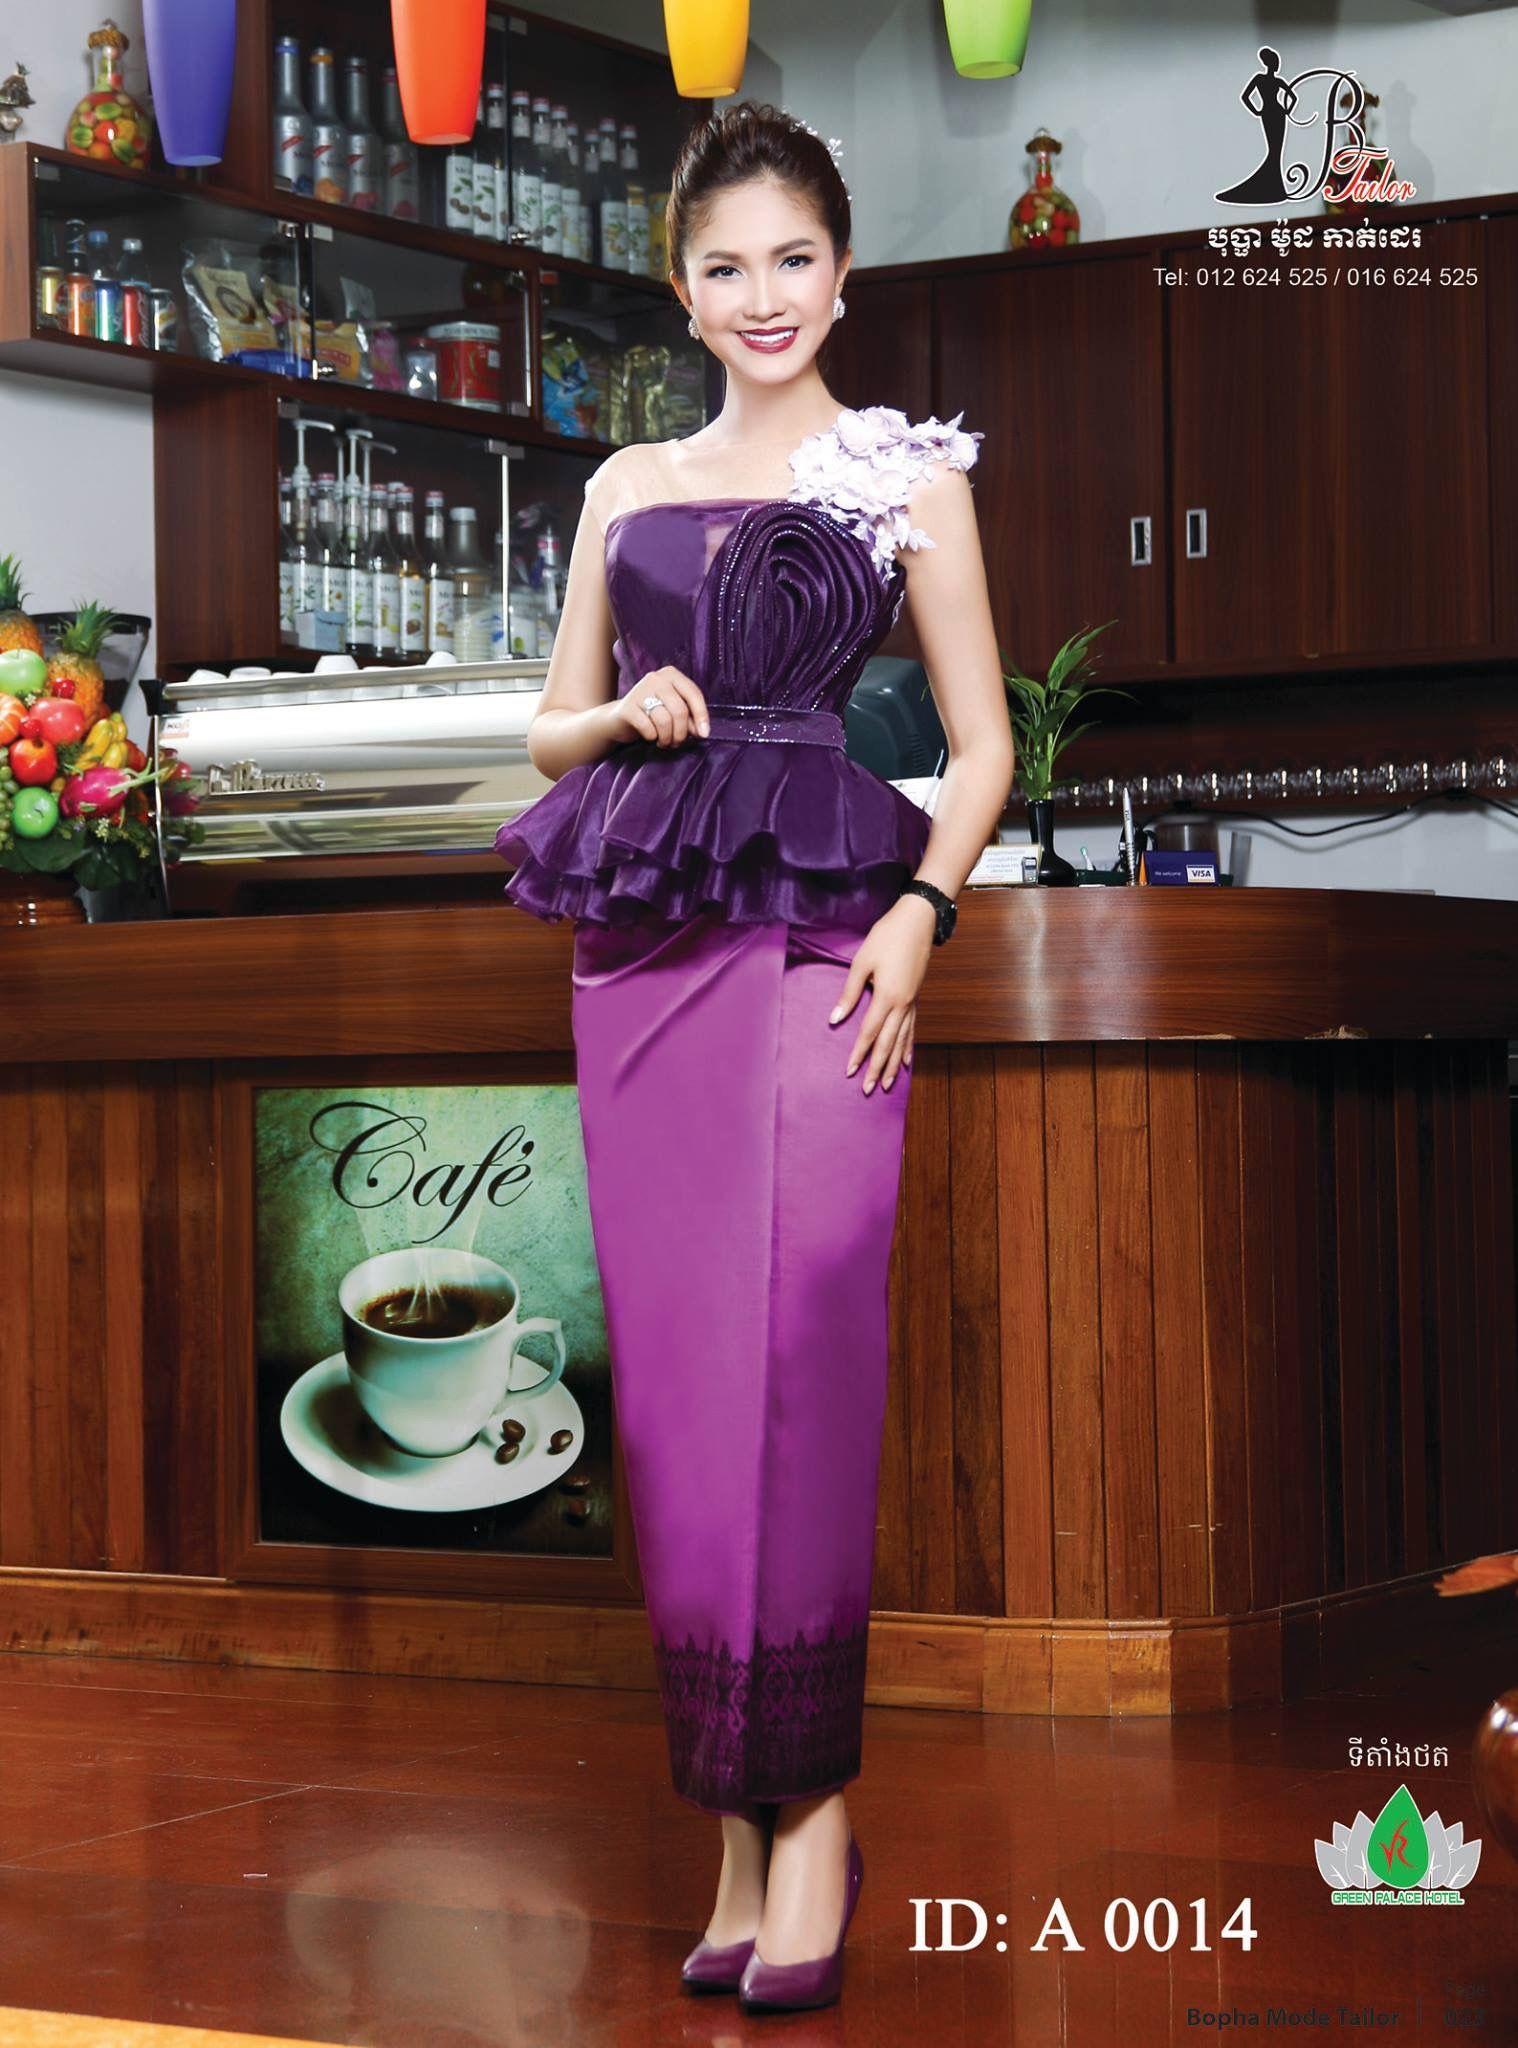 Pin de Prach Dalis en Dress Design | Pinterest | Vestiditos